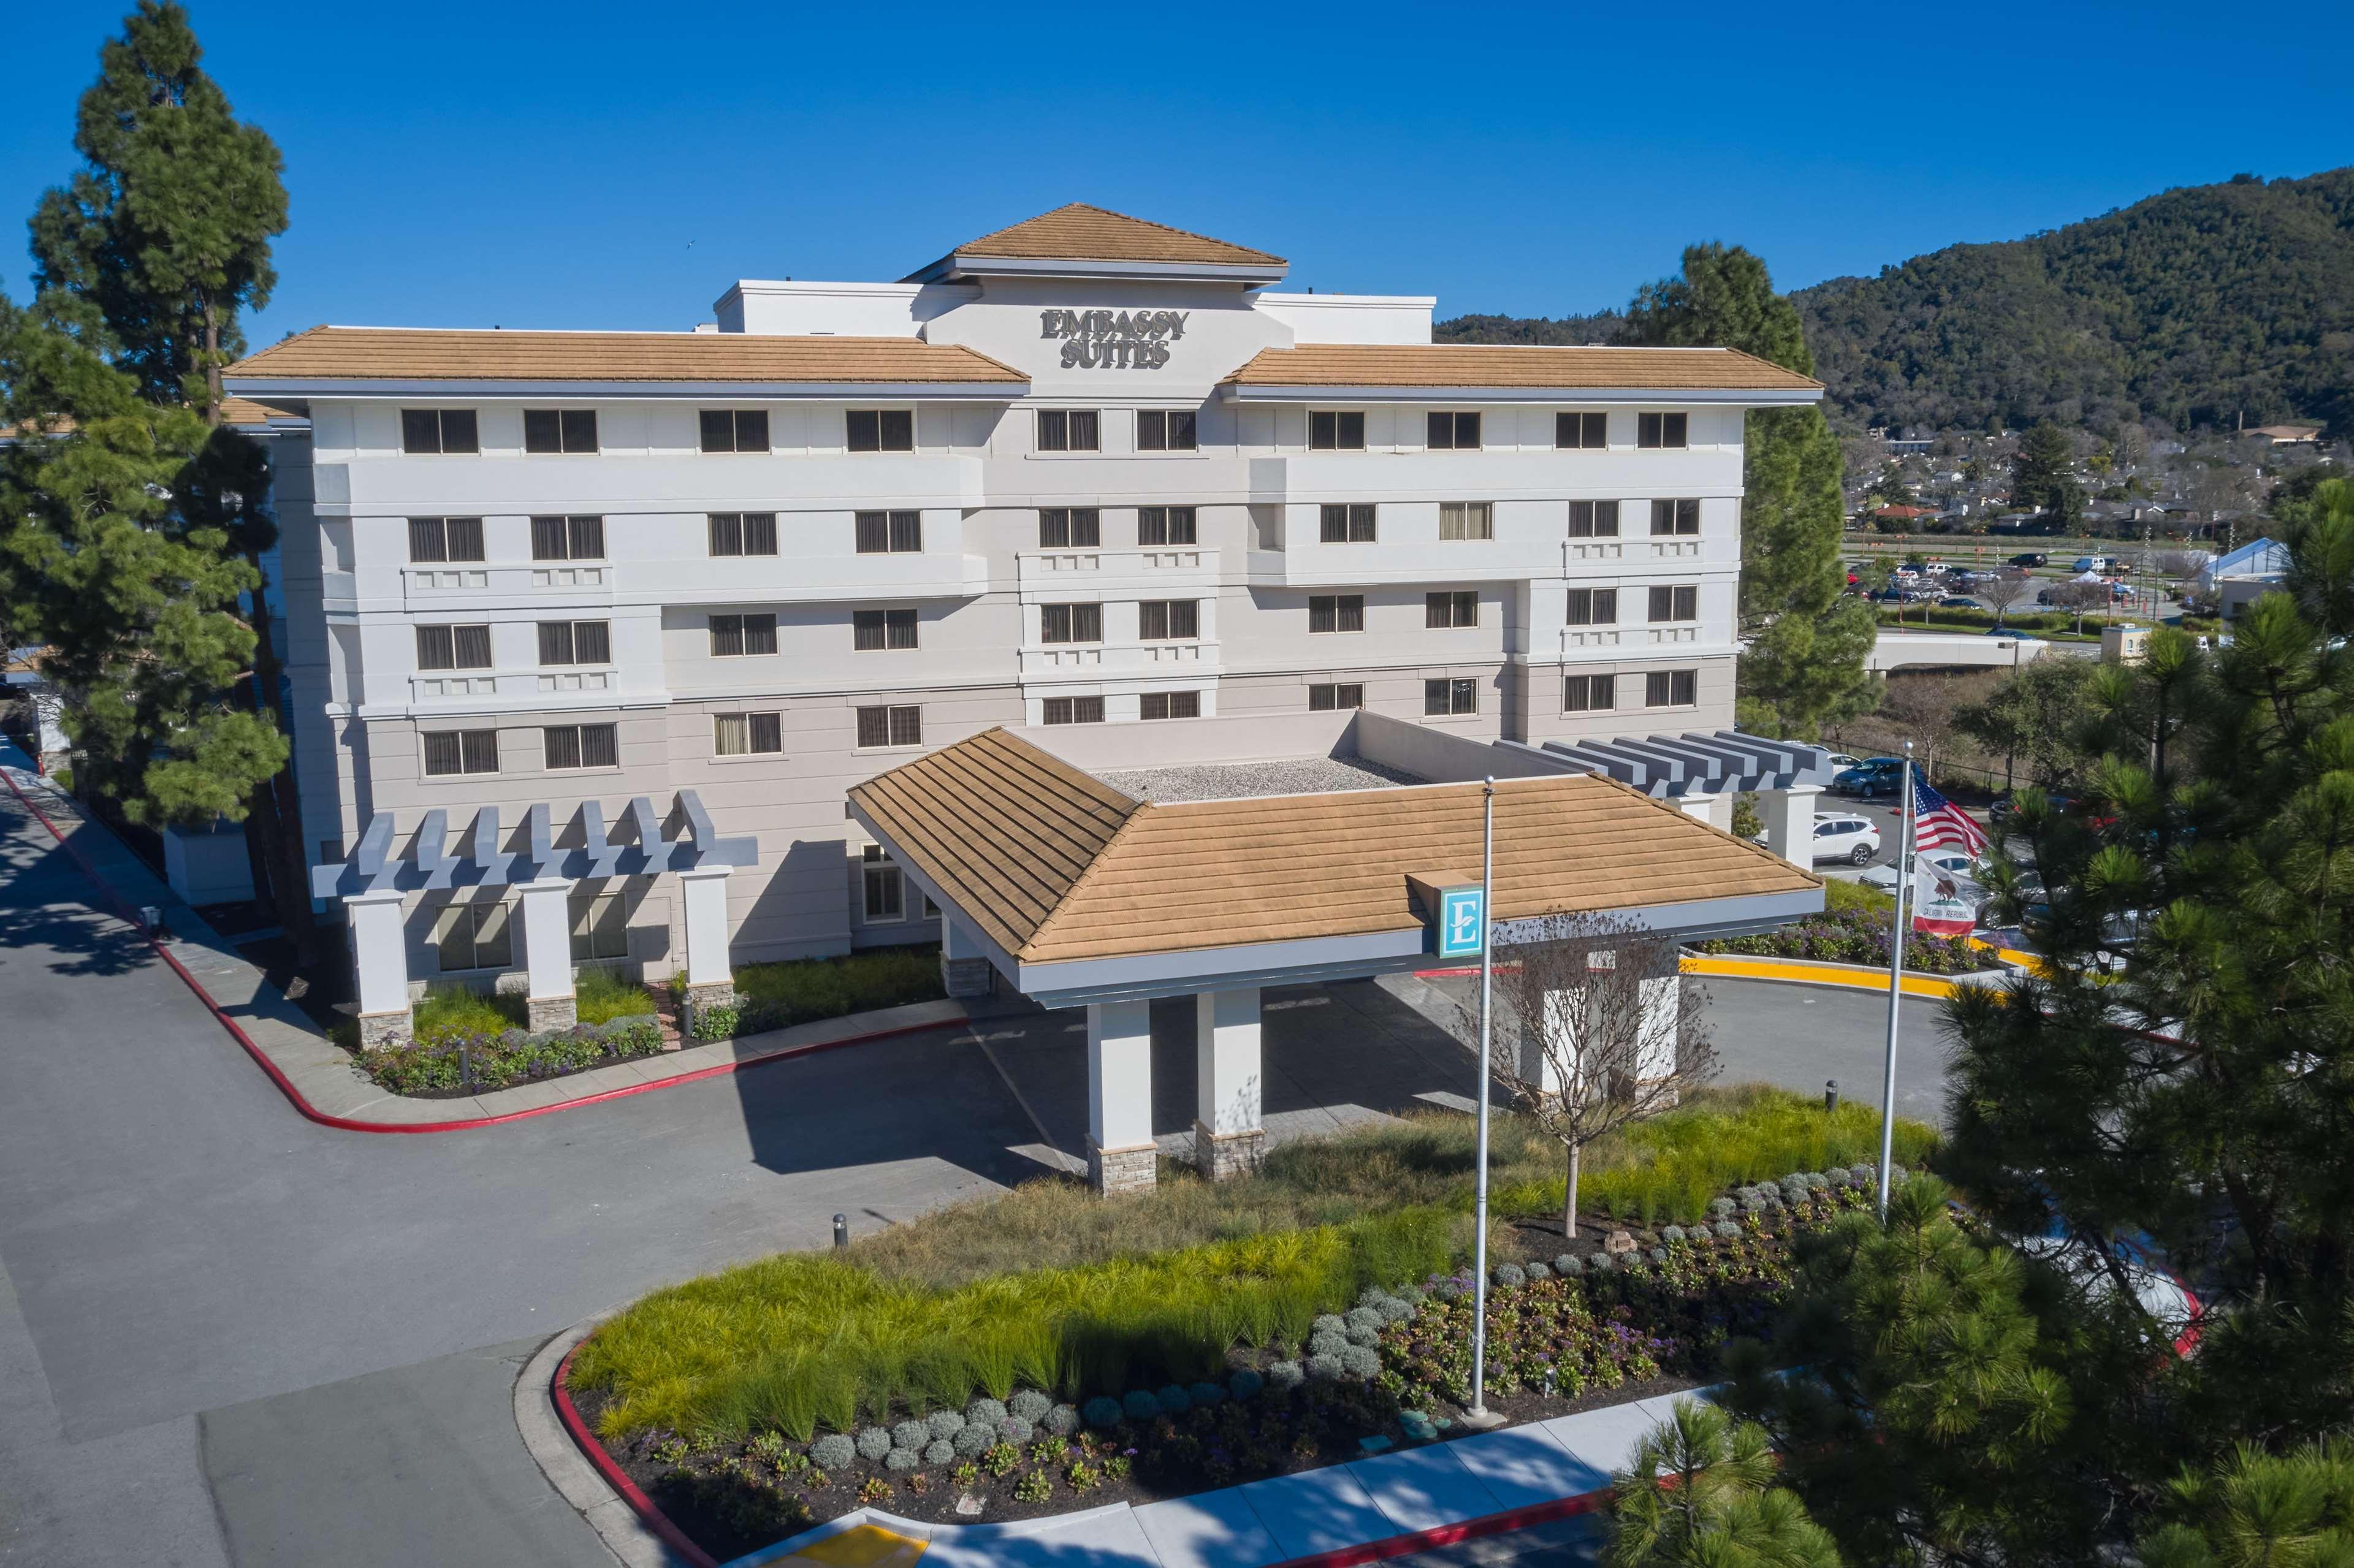 Embassy Suites San Rafael Marin County, Marin